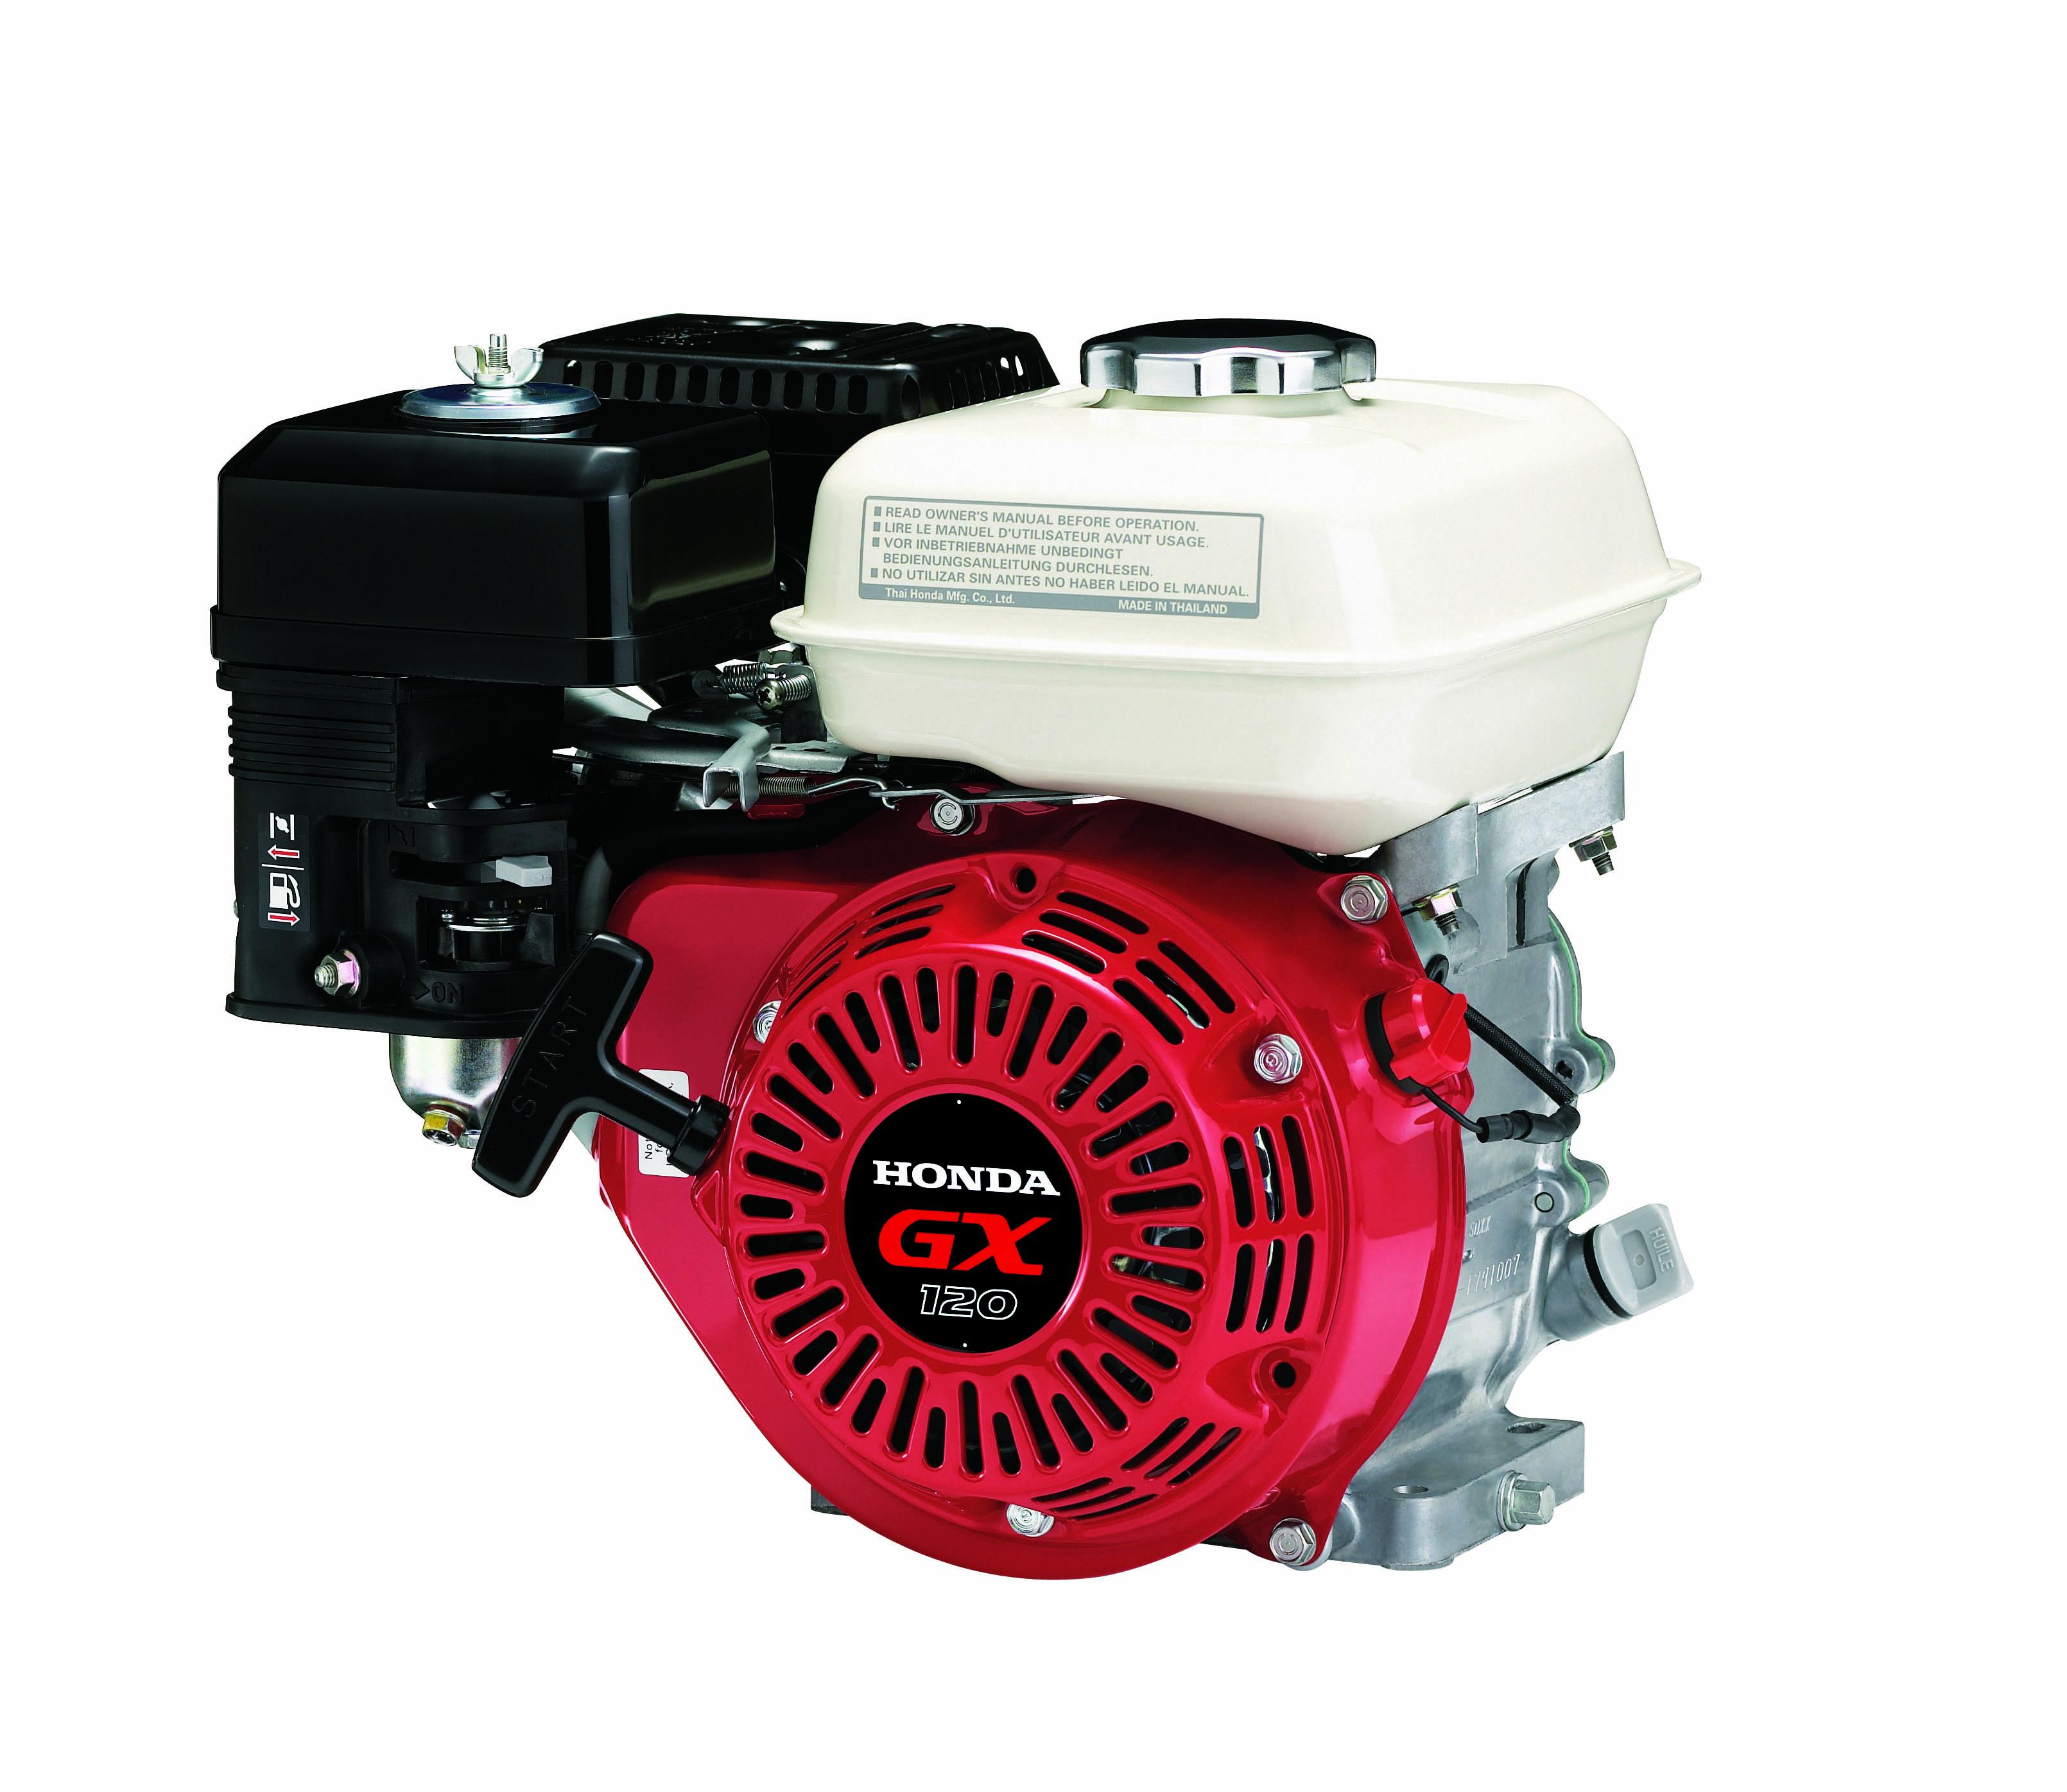 Detailed Engine Diagram 2001 Honda Accord Modern Design Of Wiring 95 Mercury Vacuum